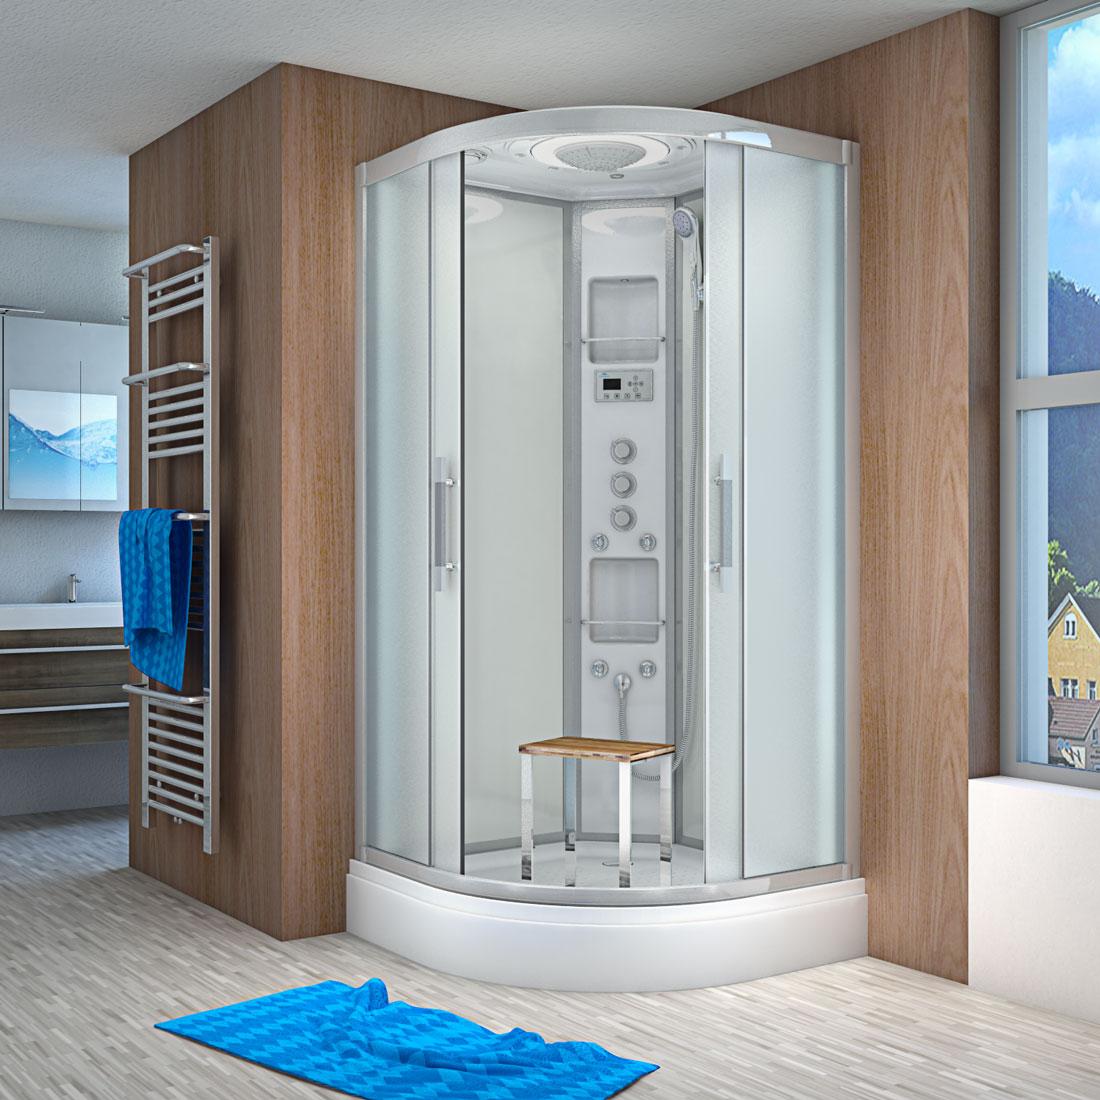 acquavapore quick26 2015 ws dusche 100x100cm. Black Bedroom Furniture Sets. Home Design Ideas